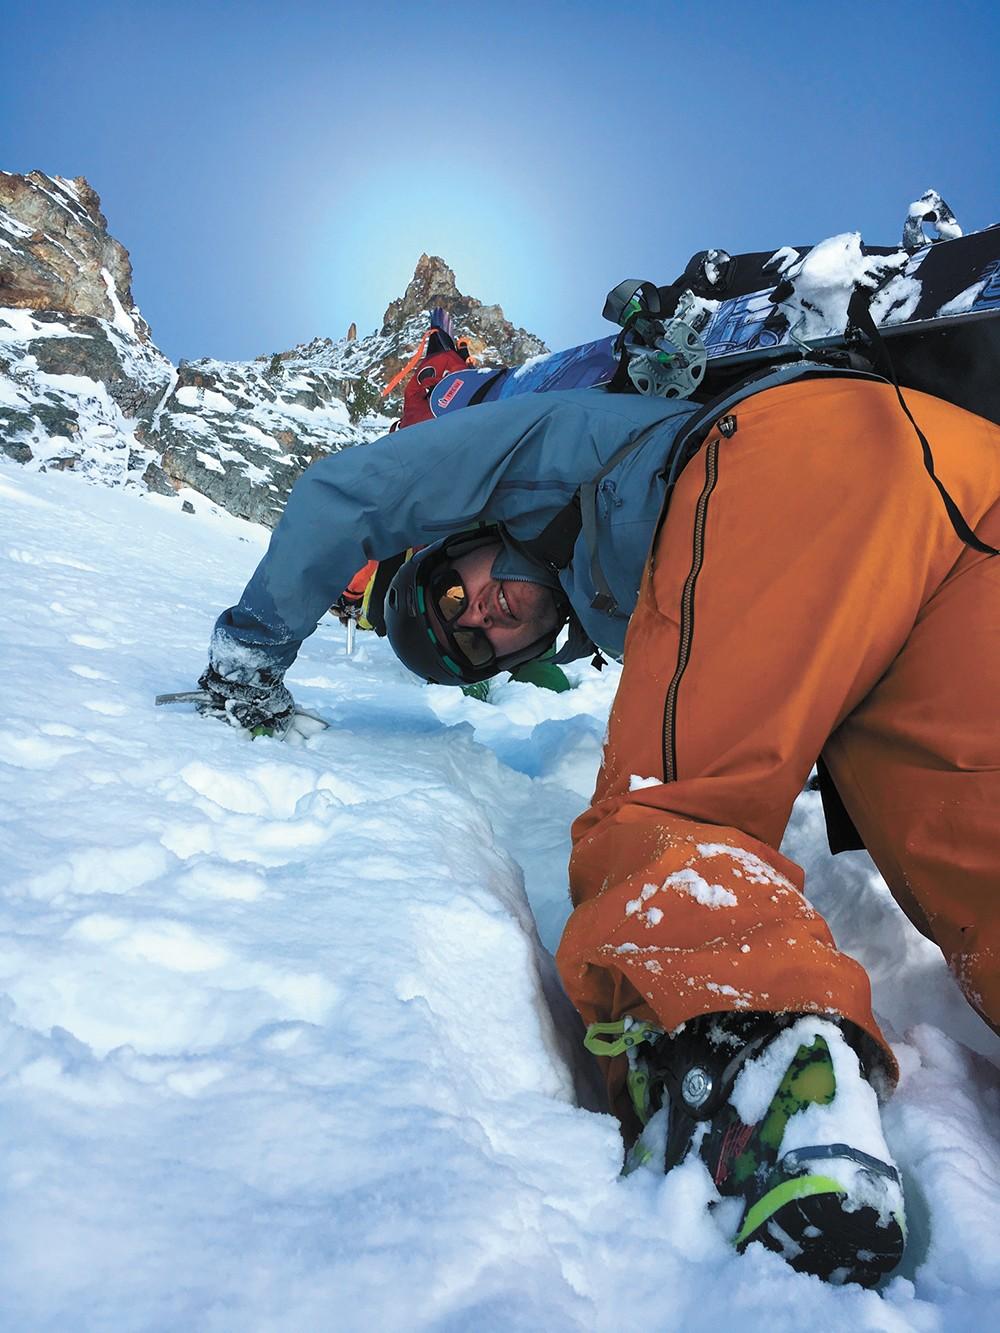 Climbing to the top. - RYAN RICARD PHOTO